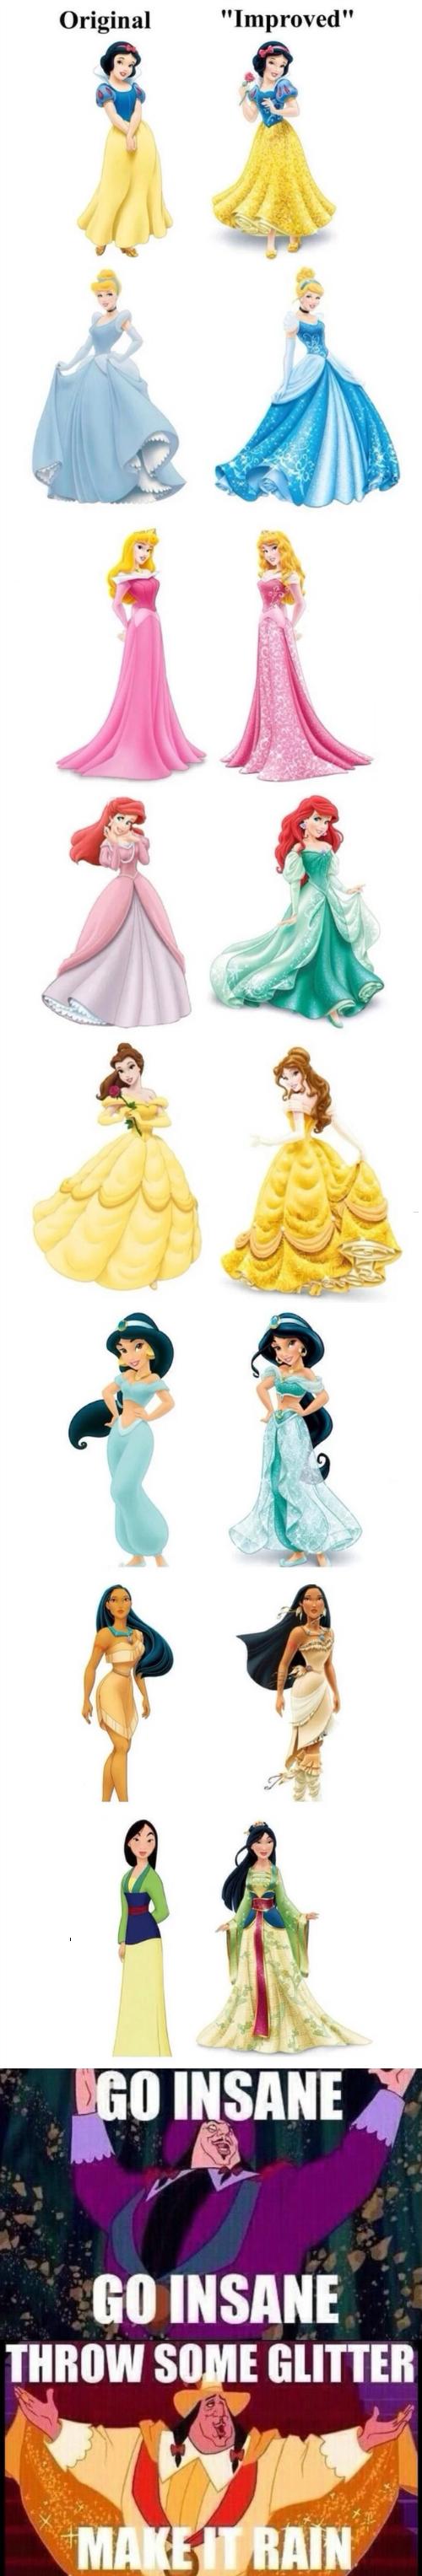 disney disney princesses - 8391128832